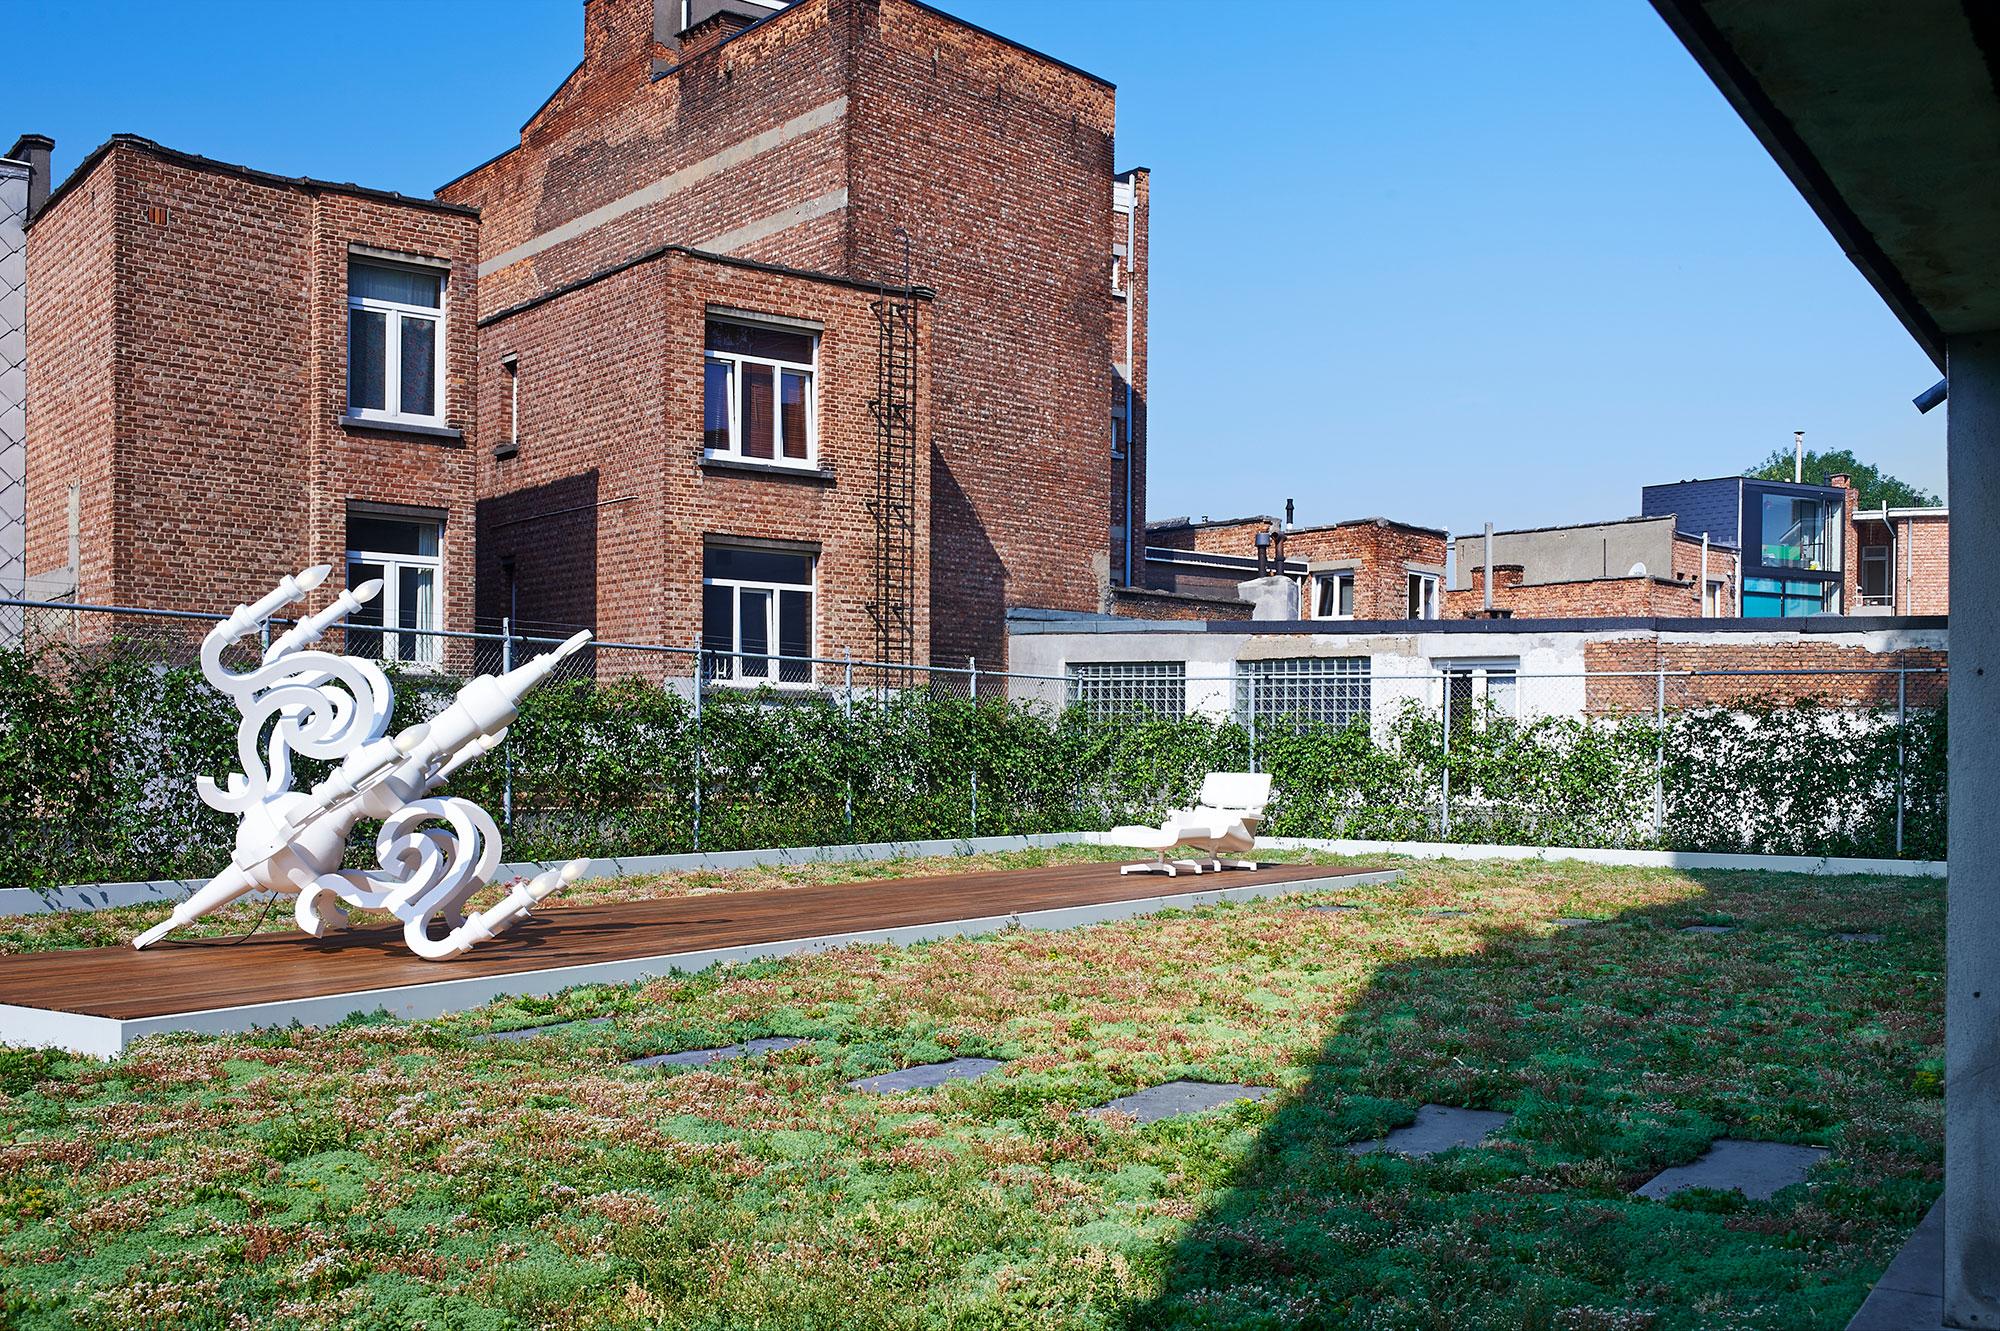 Studio-Job-Loft-1st-floor-garden-ph-Dennis-Brandsma-22713-0051